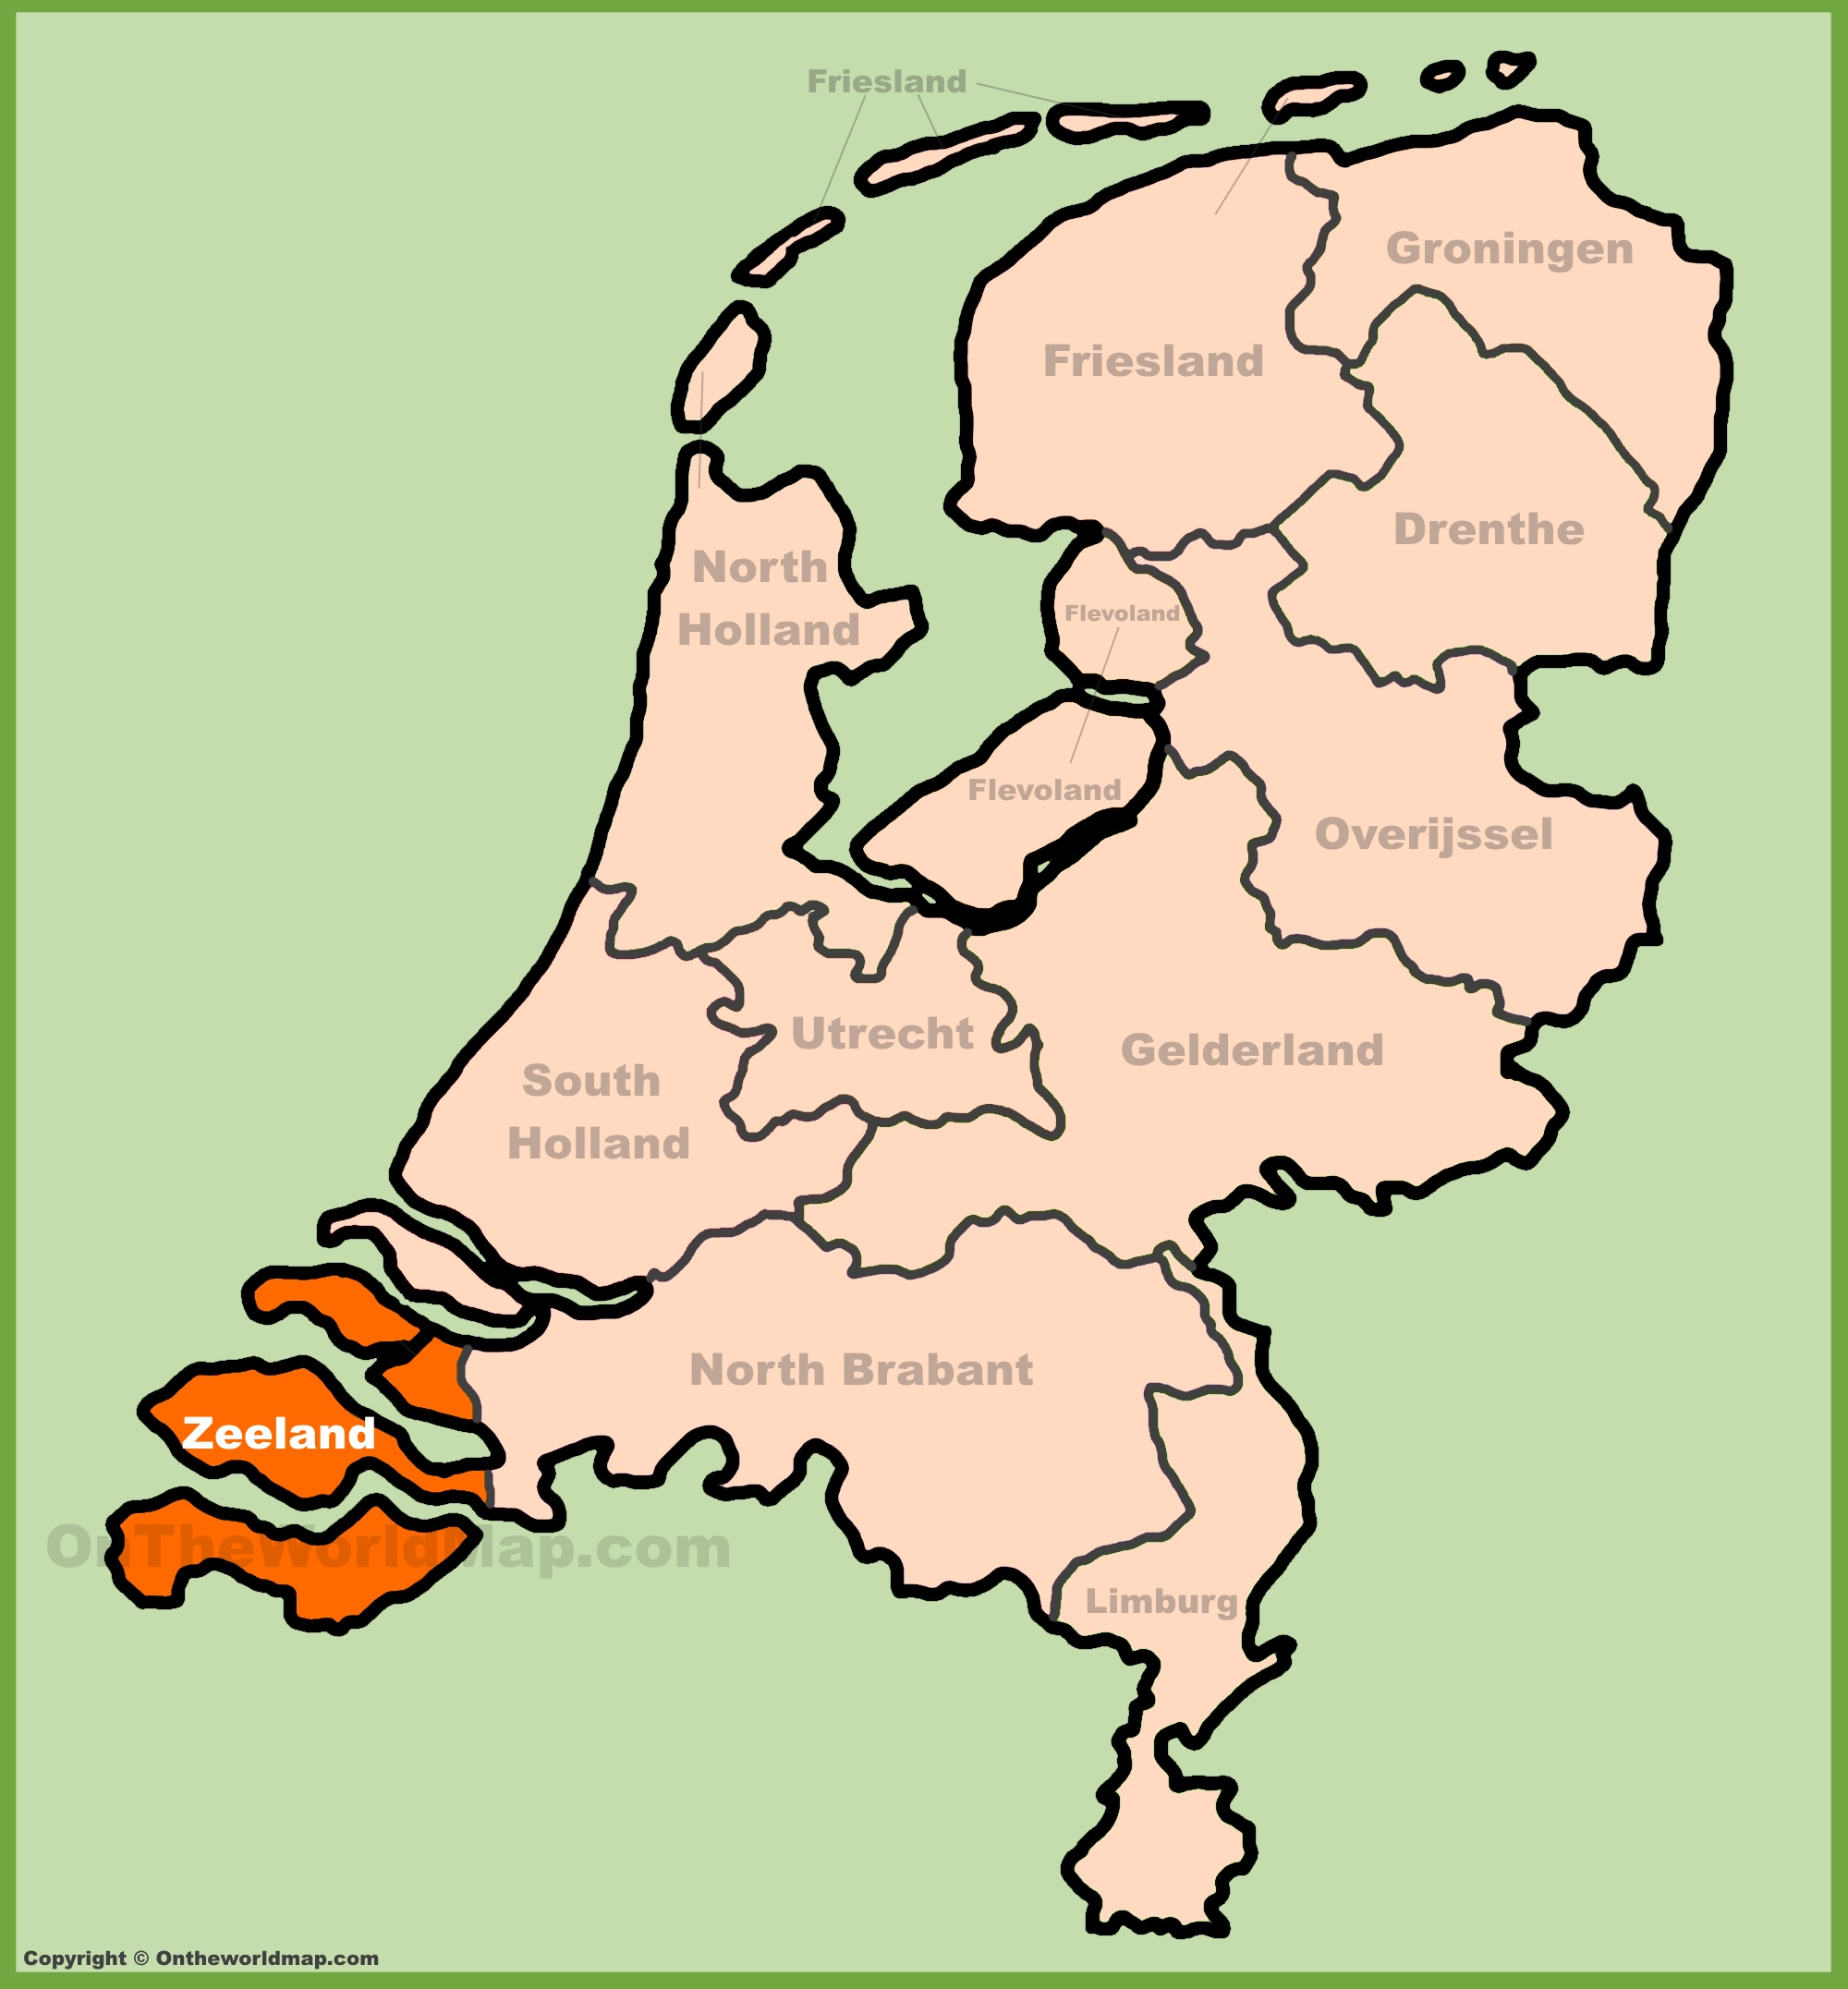 Zeeland location on the Netherlands map